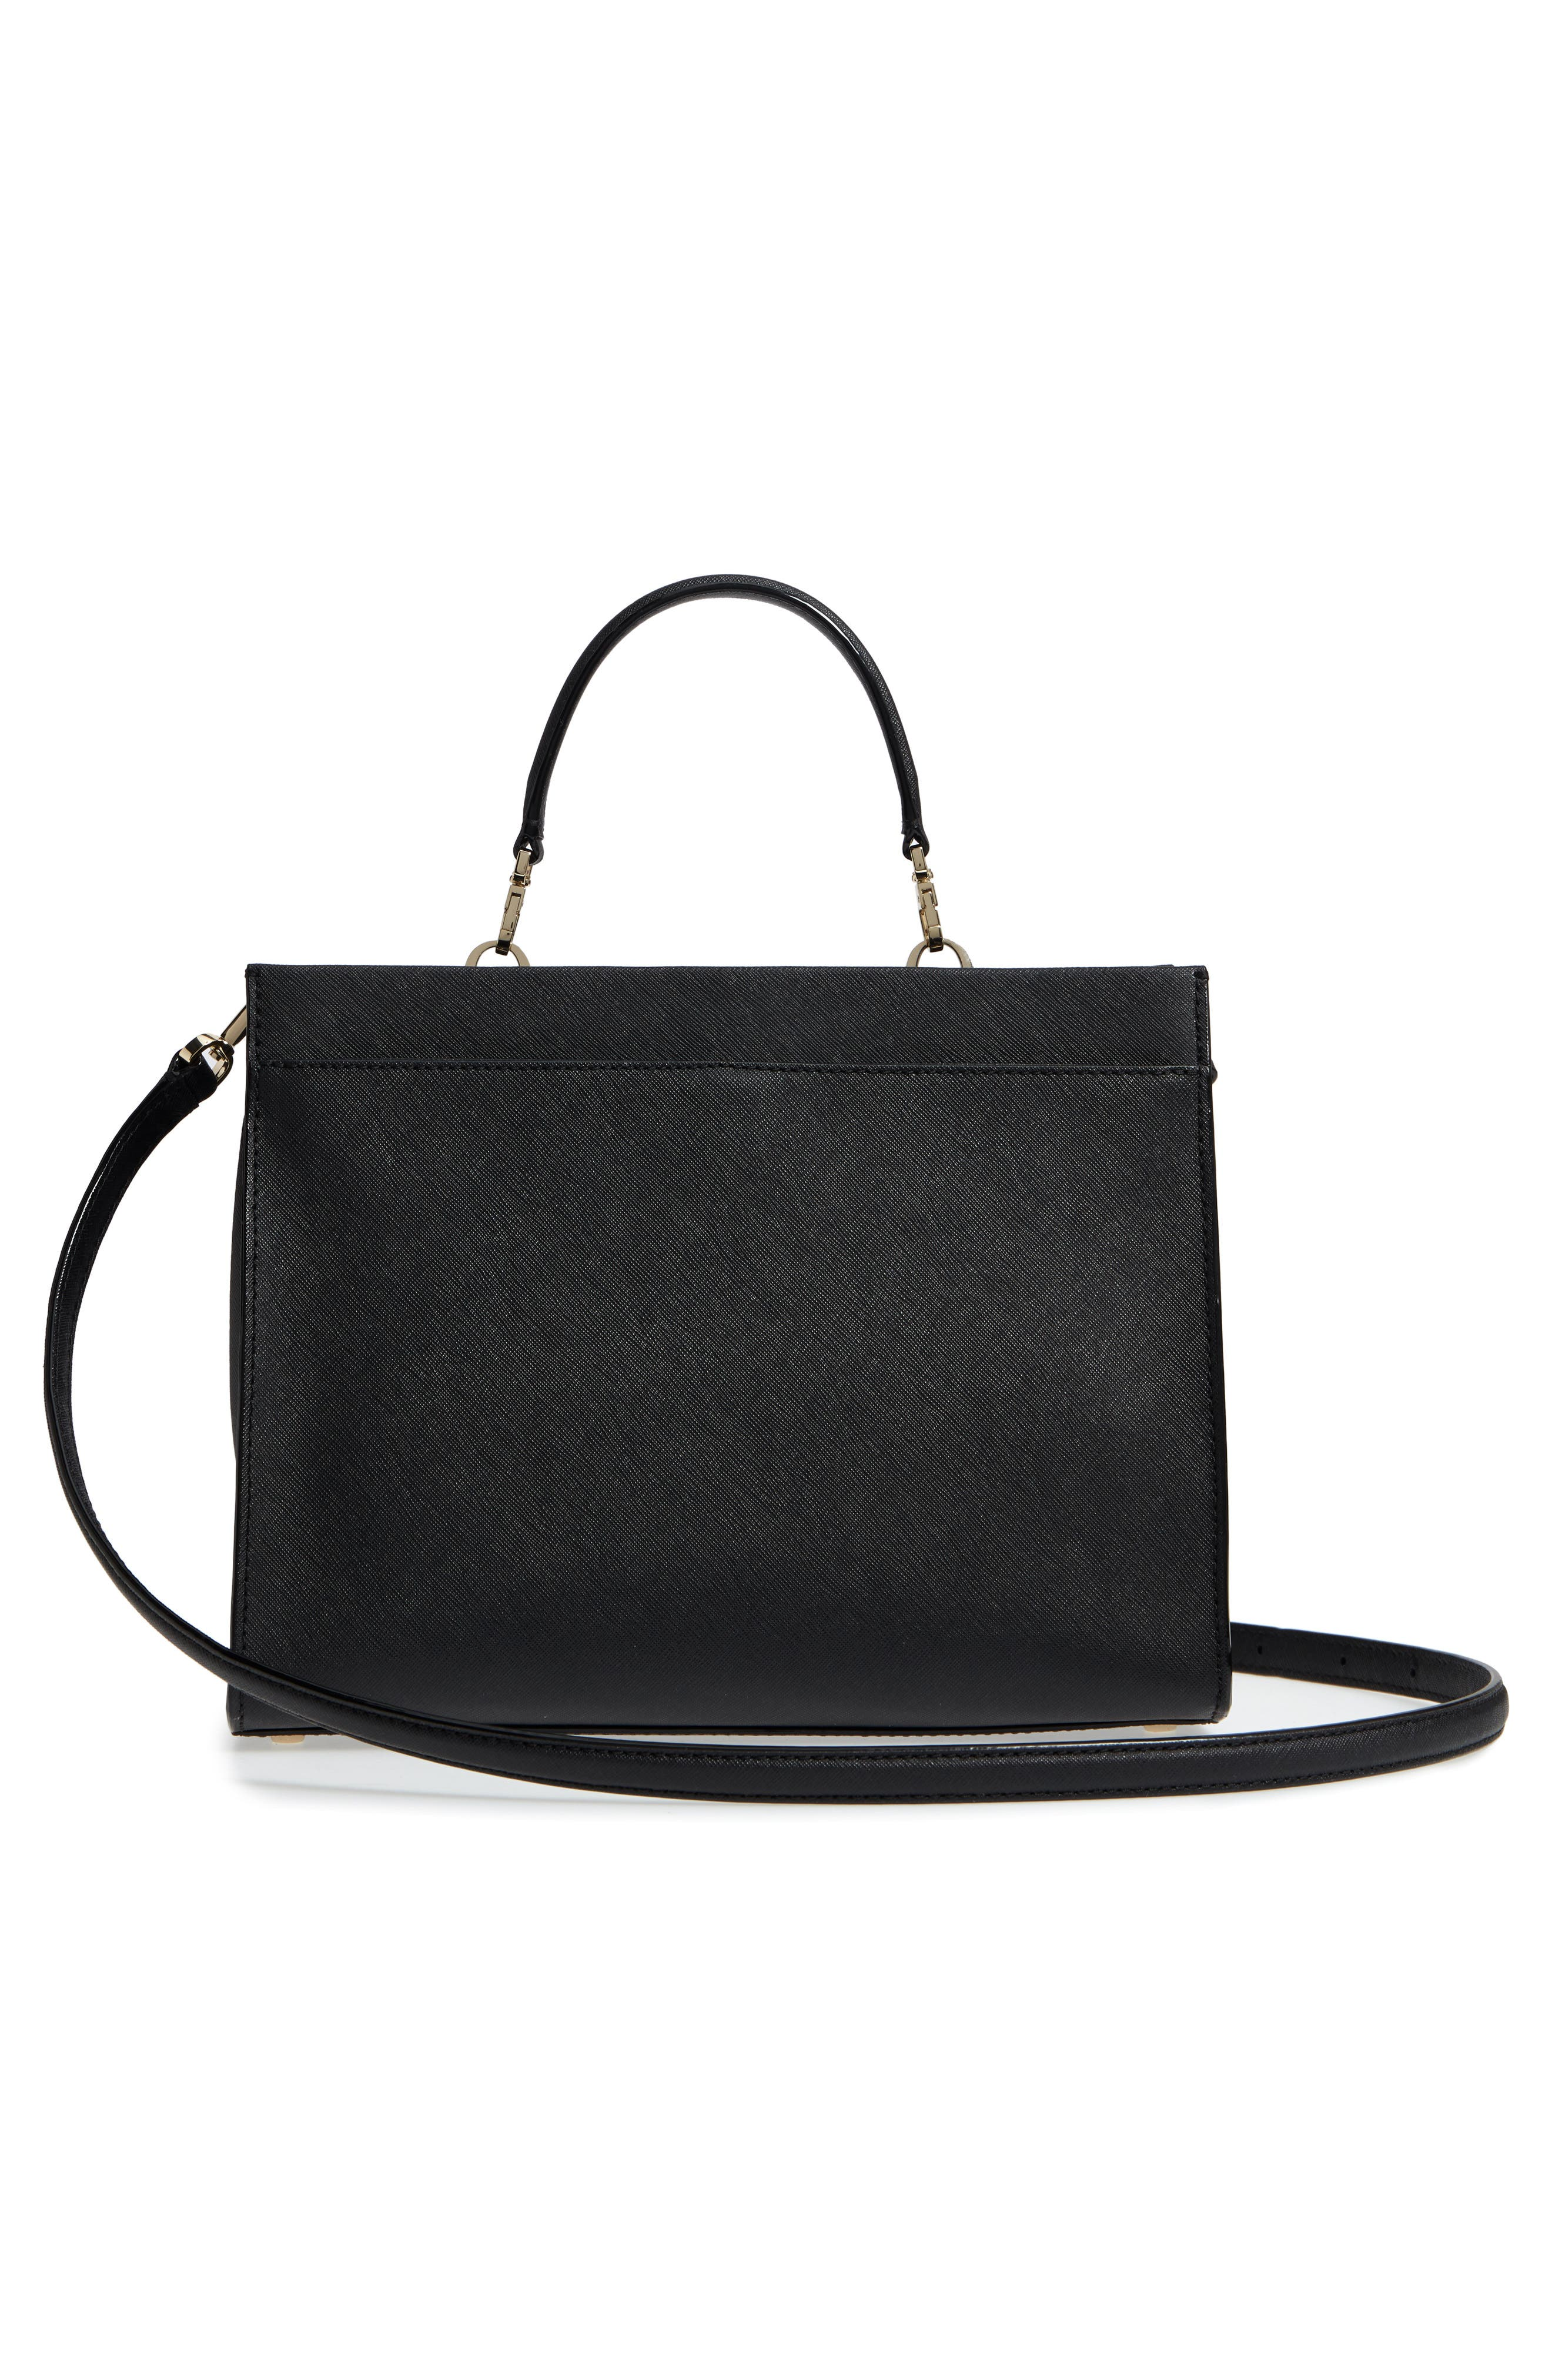 cameron street - sara leather satchel,                             Alternate thumbnail 3, color,                             001